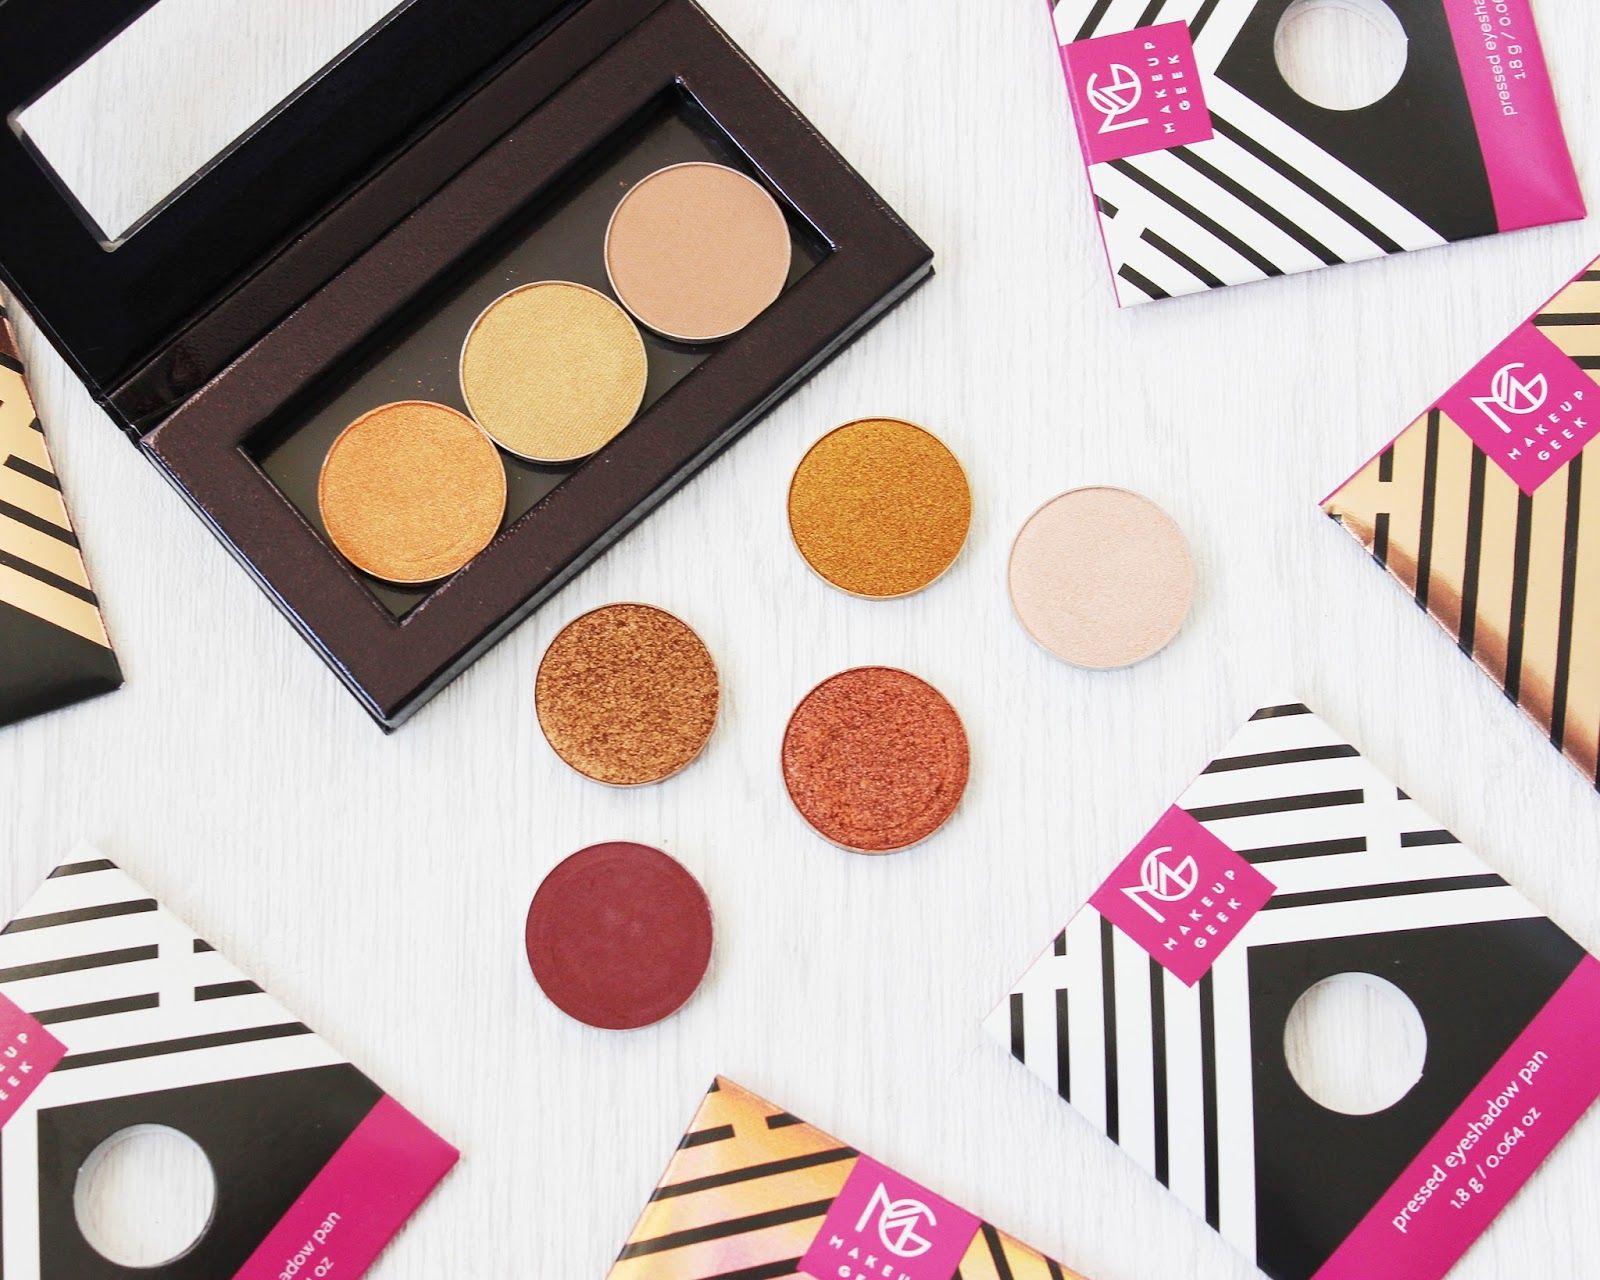 Makeup Geek eye shadow review and swatches Makeup geek